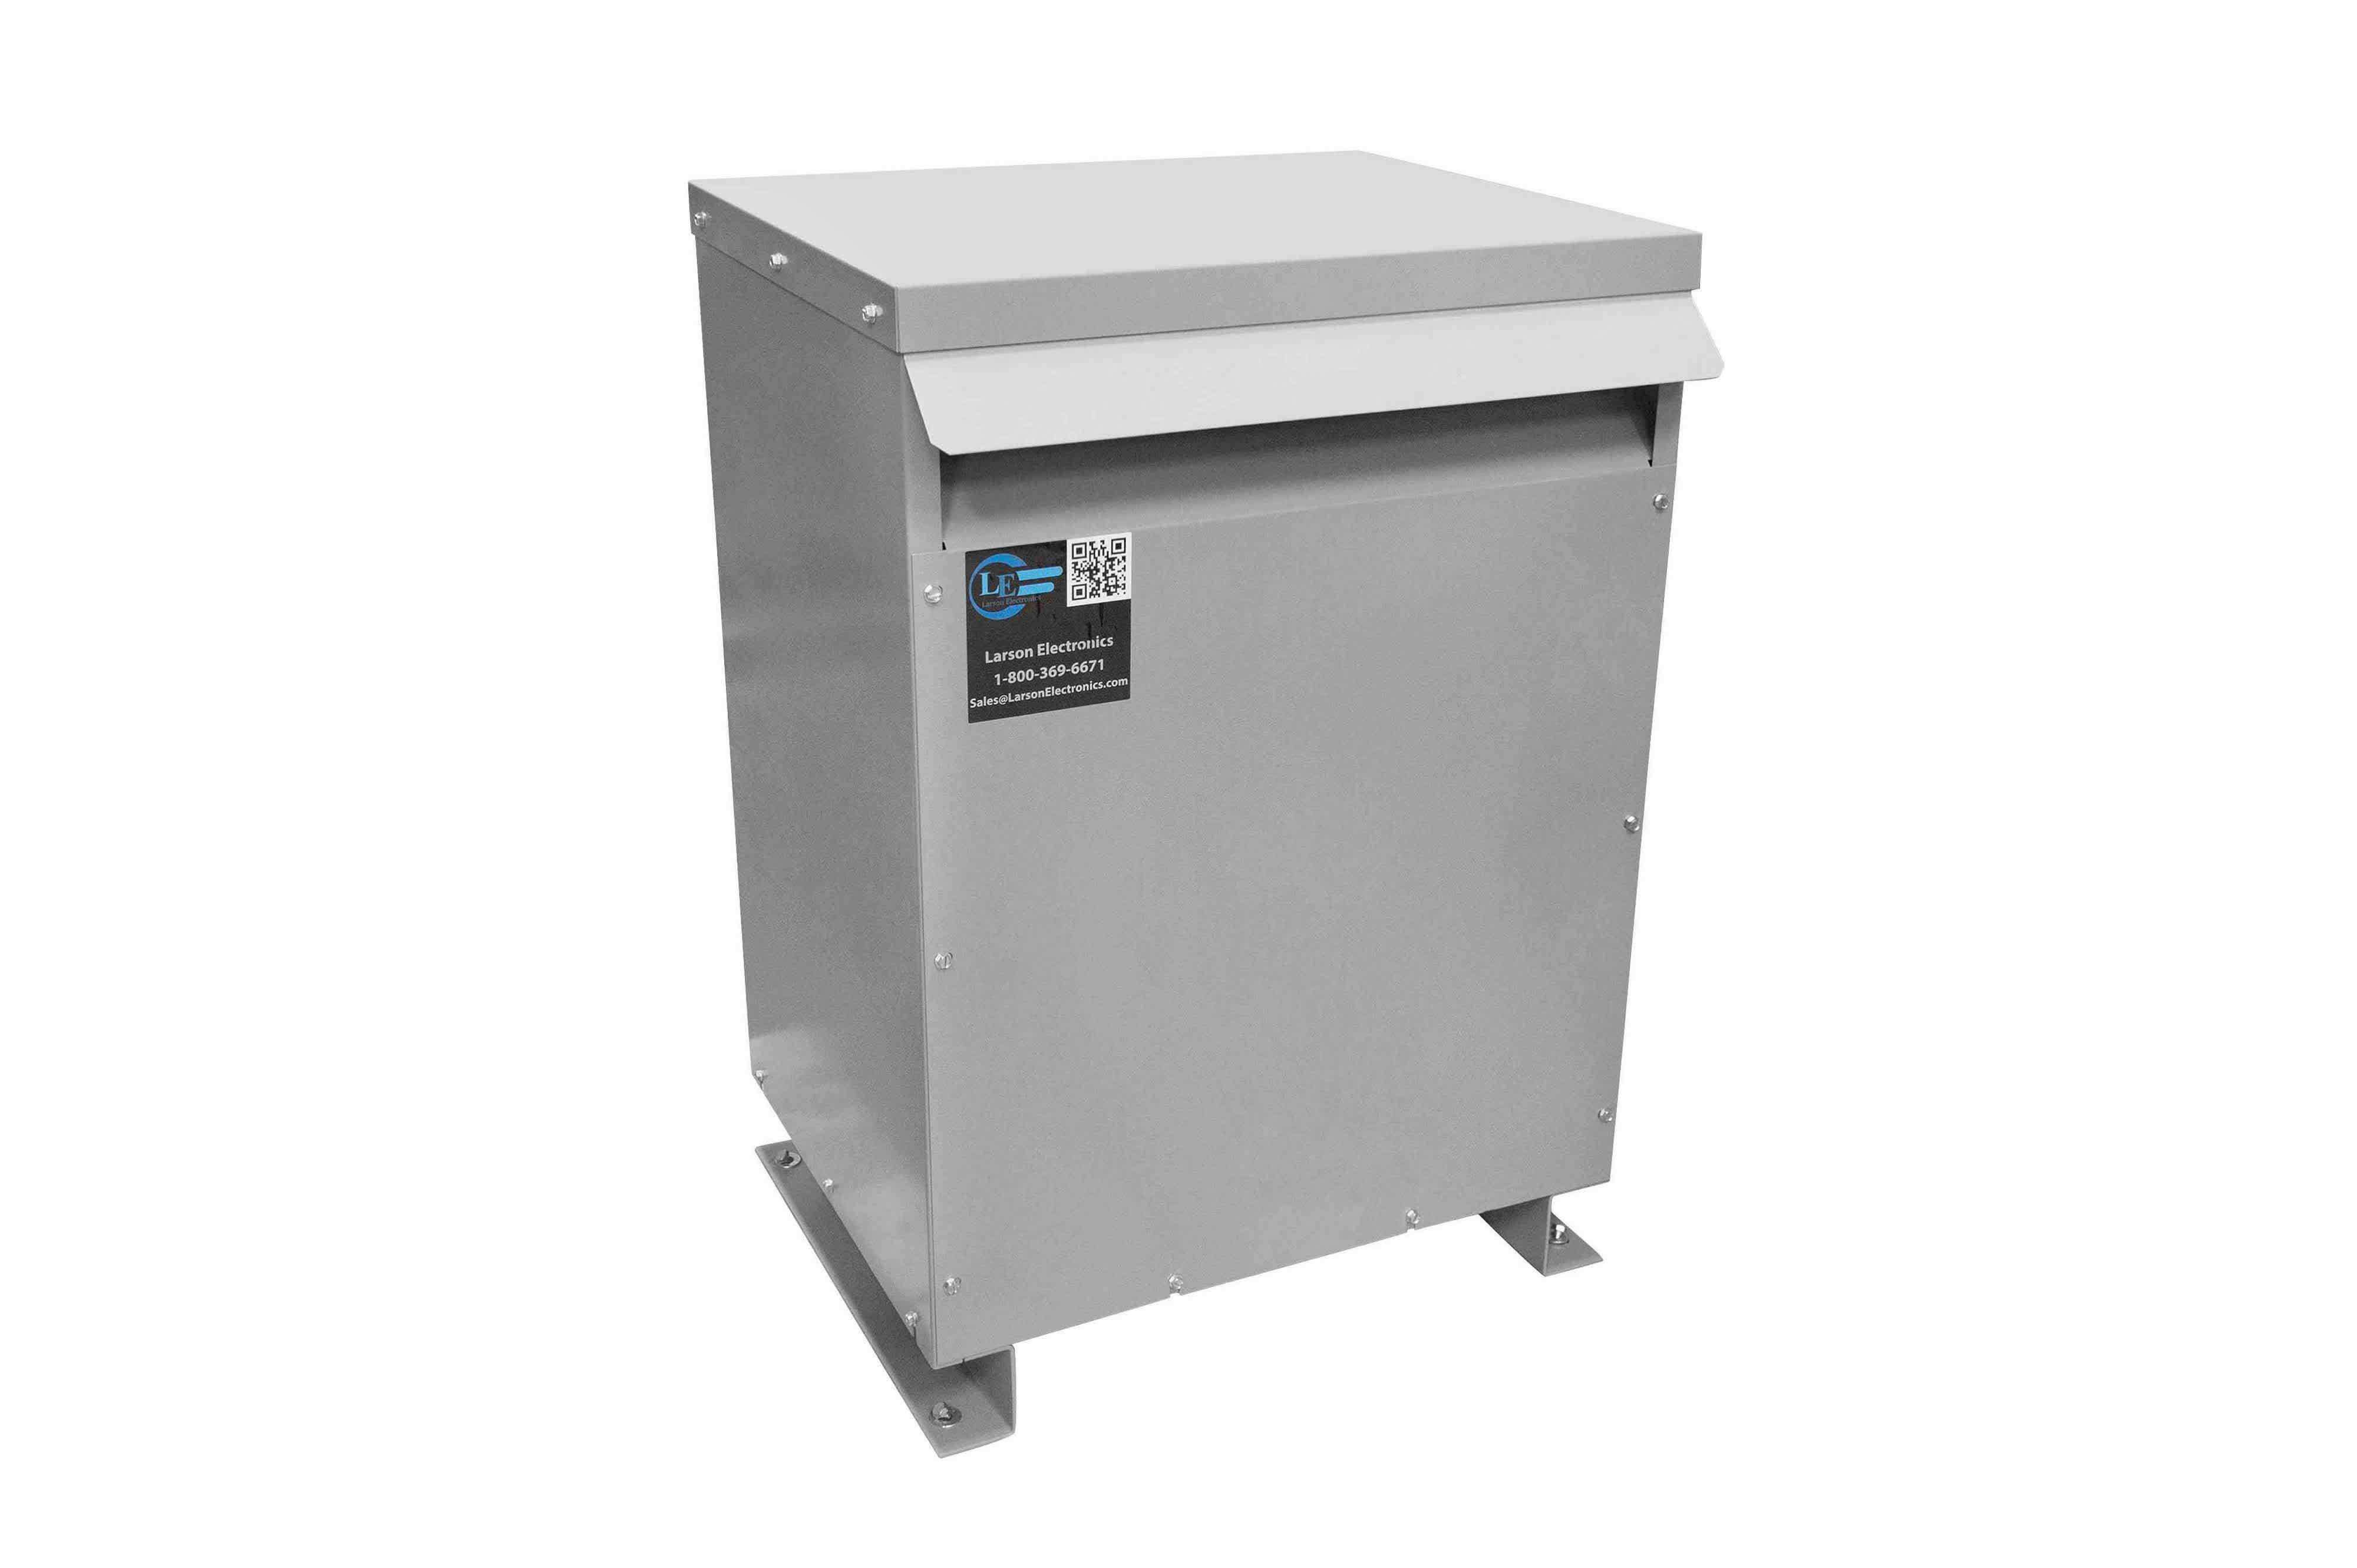 40 kVA 3PH Isolation Transformer, 400V Wye Primary, 600V Delta Secondary, N3R, Ventilated, 60 Hz